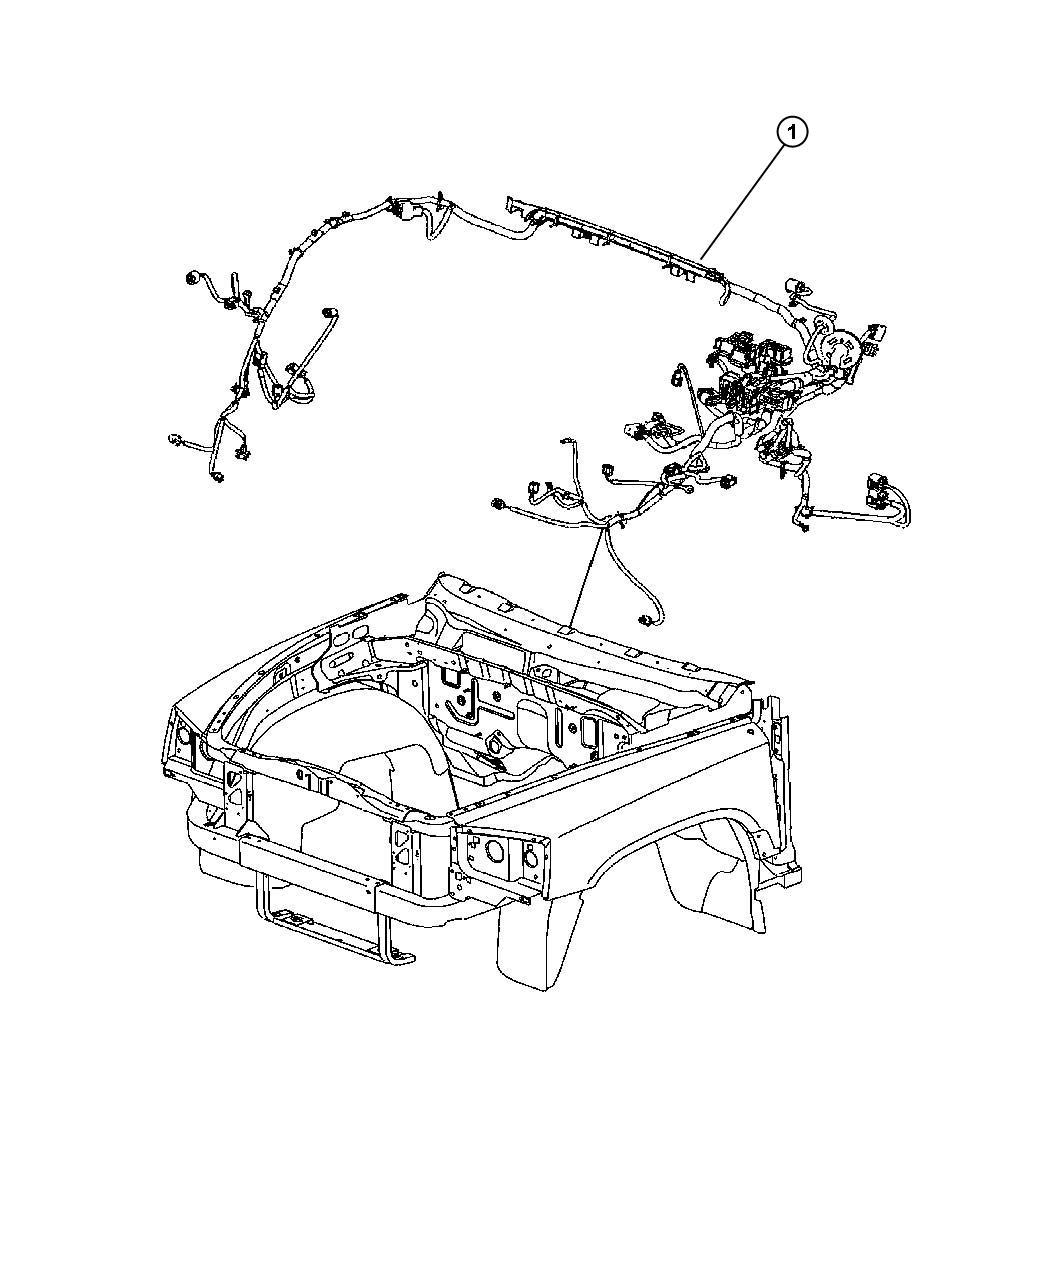 Dodge Dakota Wiring Headlamp To Dash Pwr Disc Drum Rr